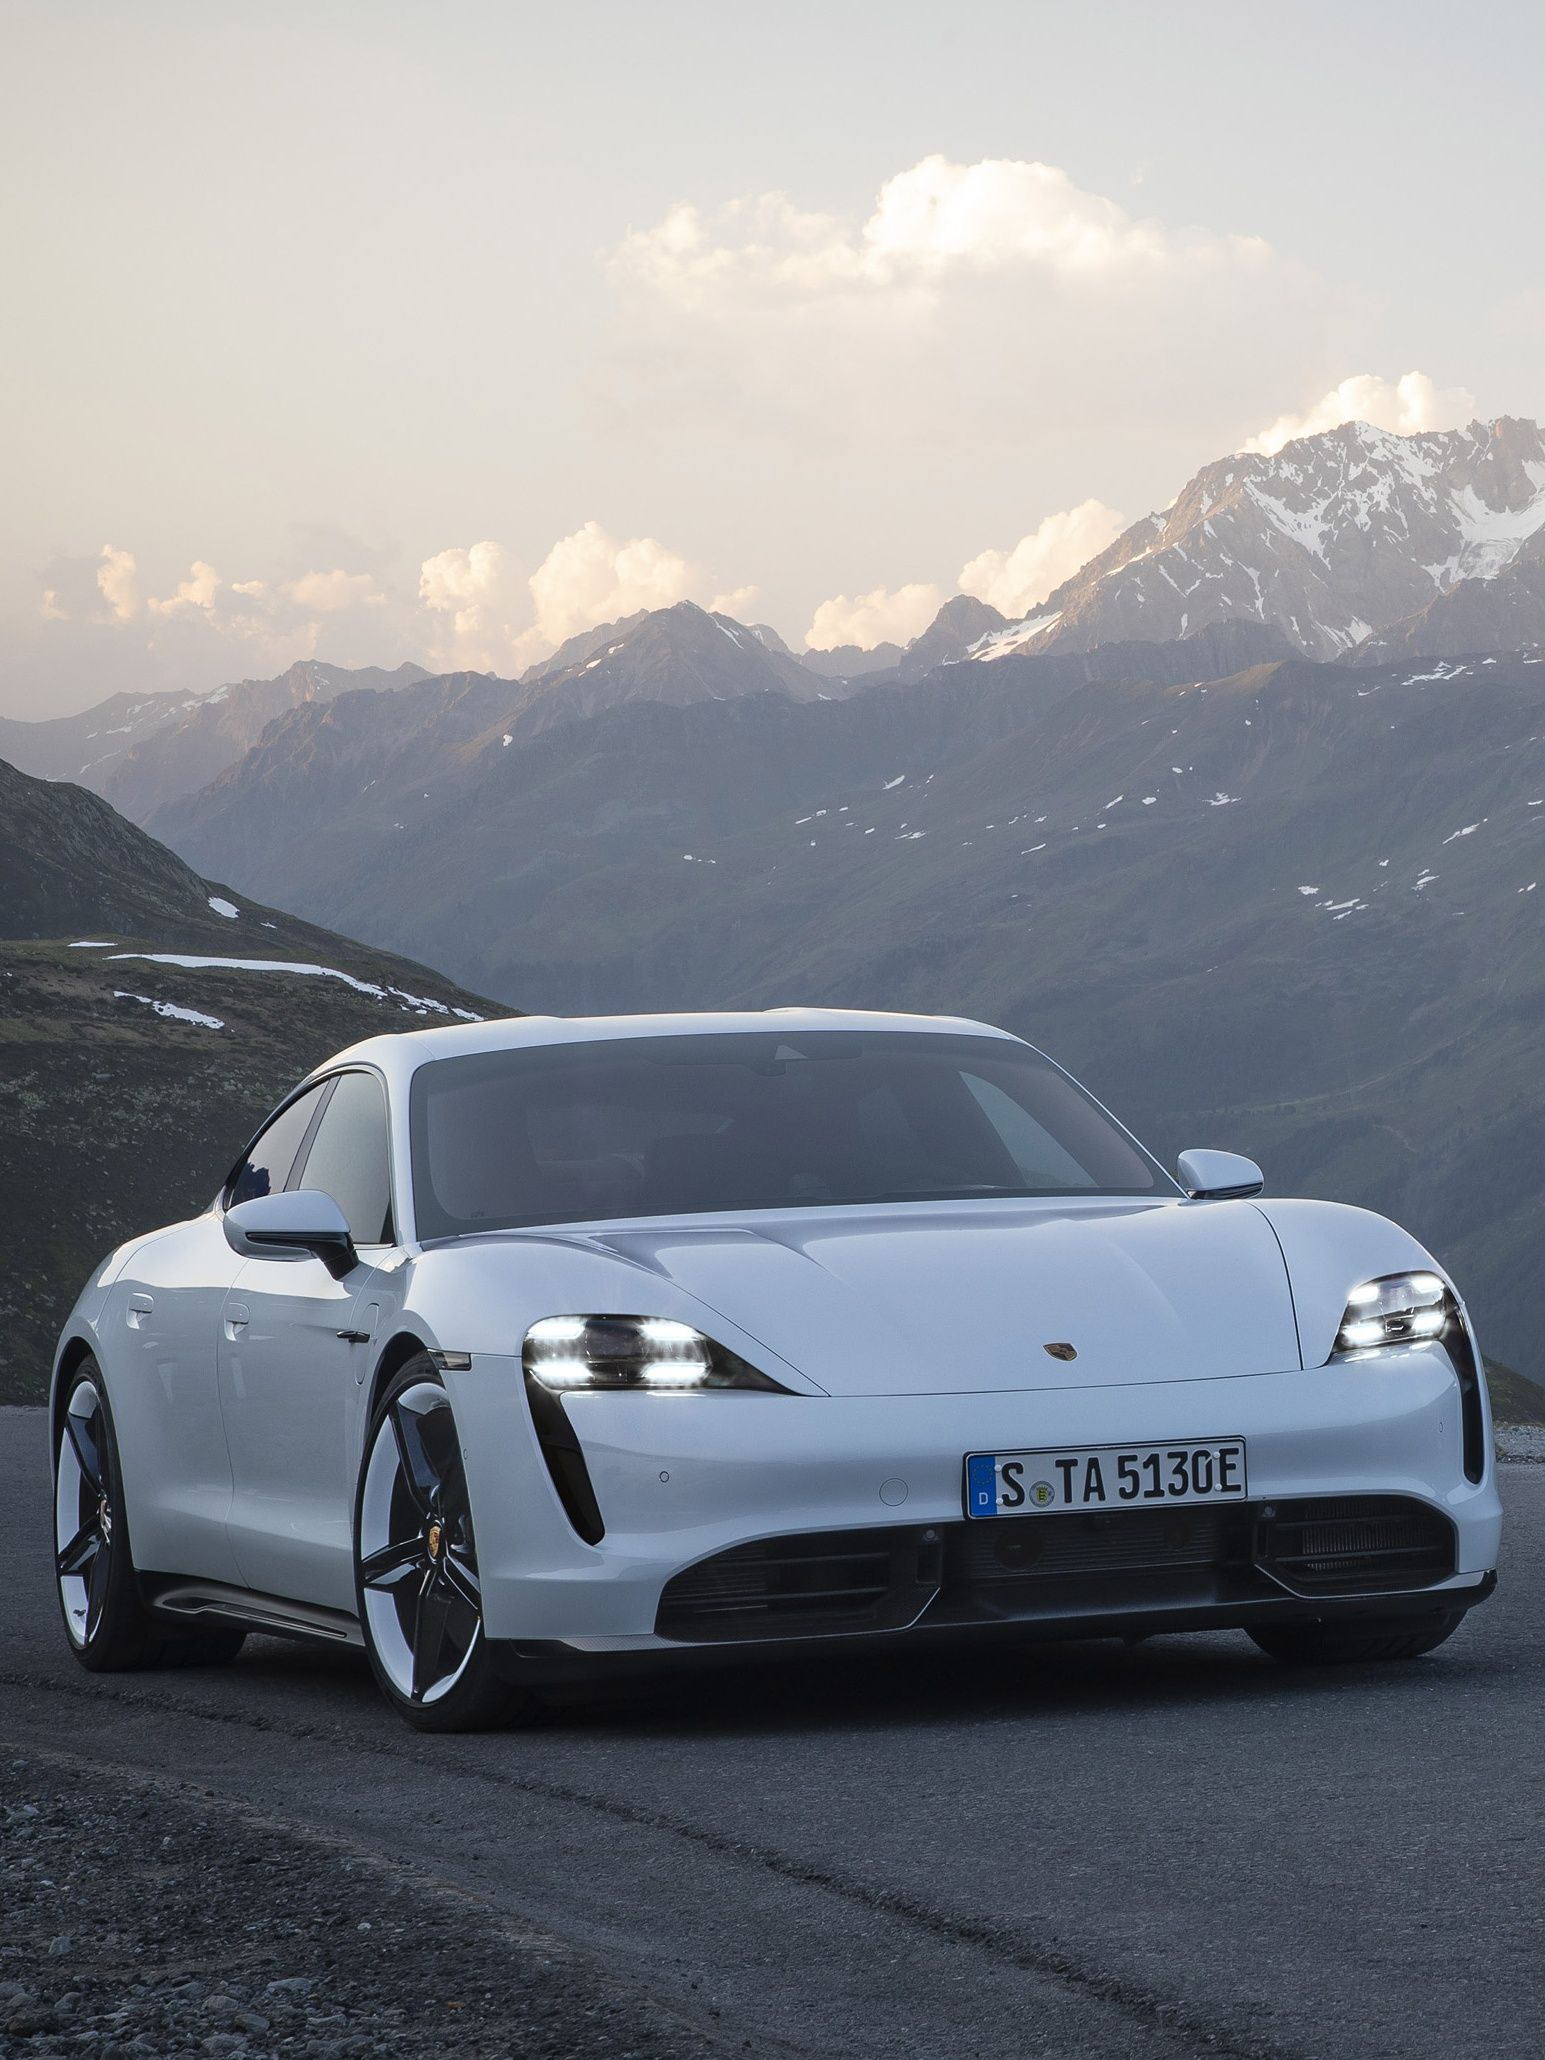 Beautiful 2020 Porsche Taycan Porsche Taycan Porsche Cars Electric Car Concept